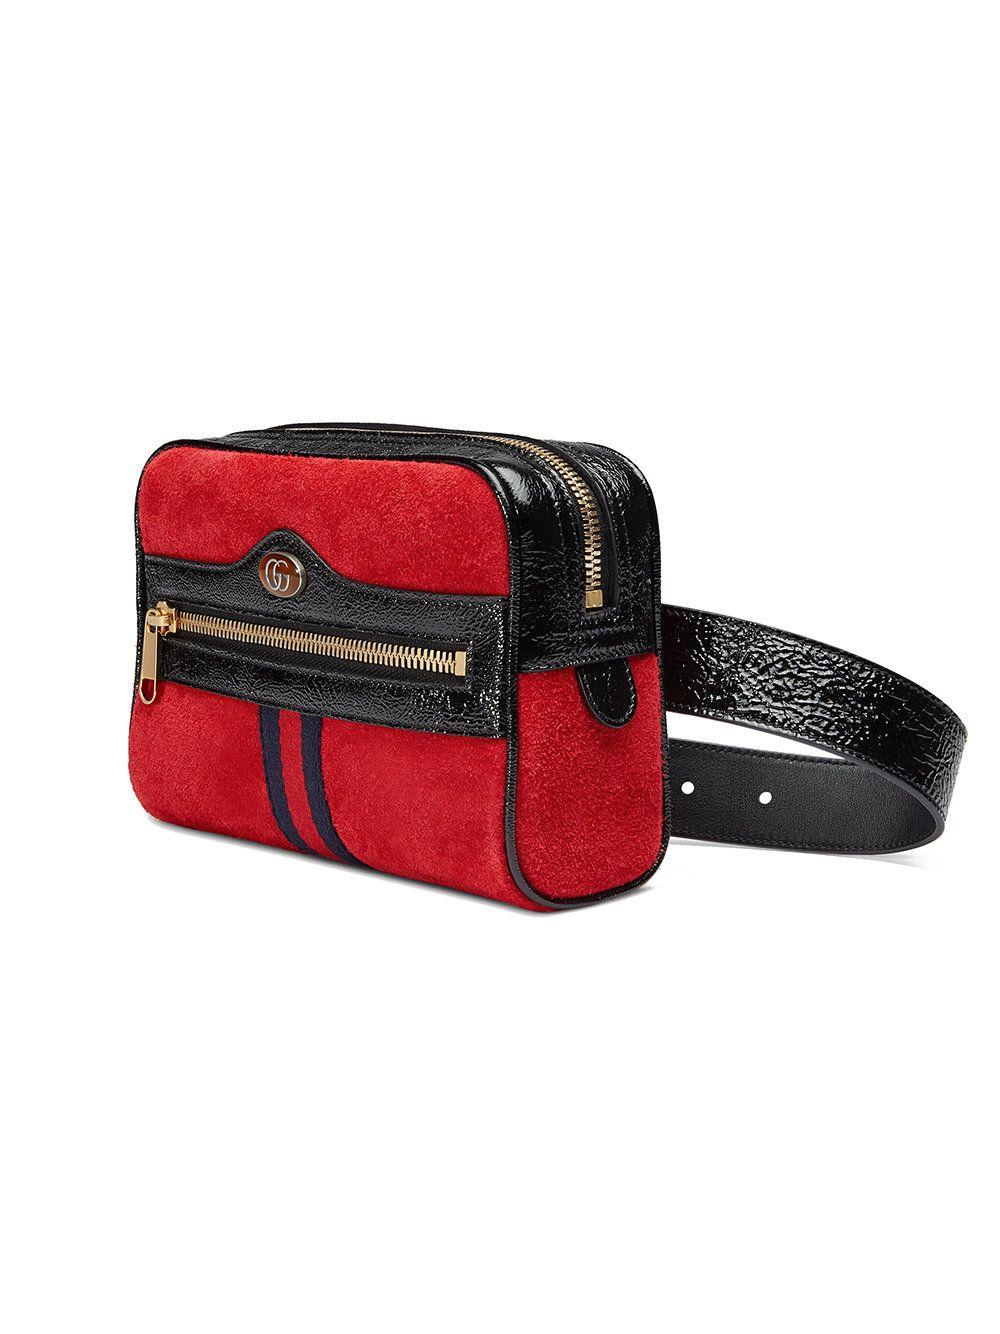 6b11b759324 Gucci Ophidia Small Belt Bag - Farfetch